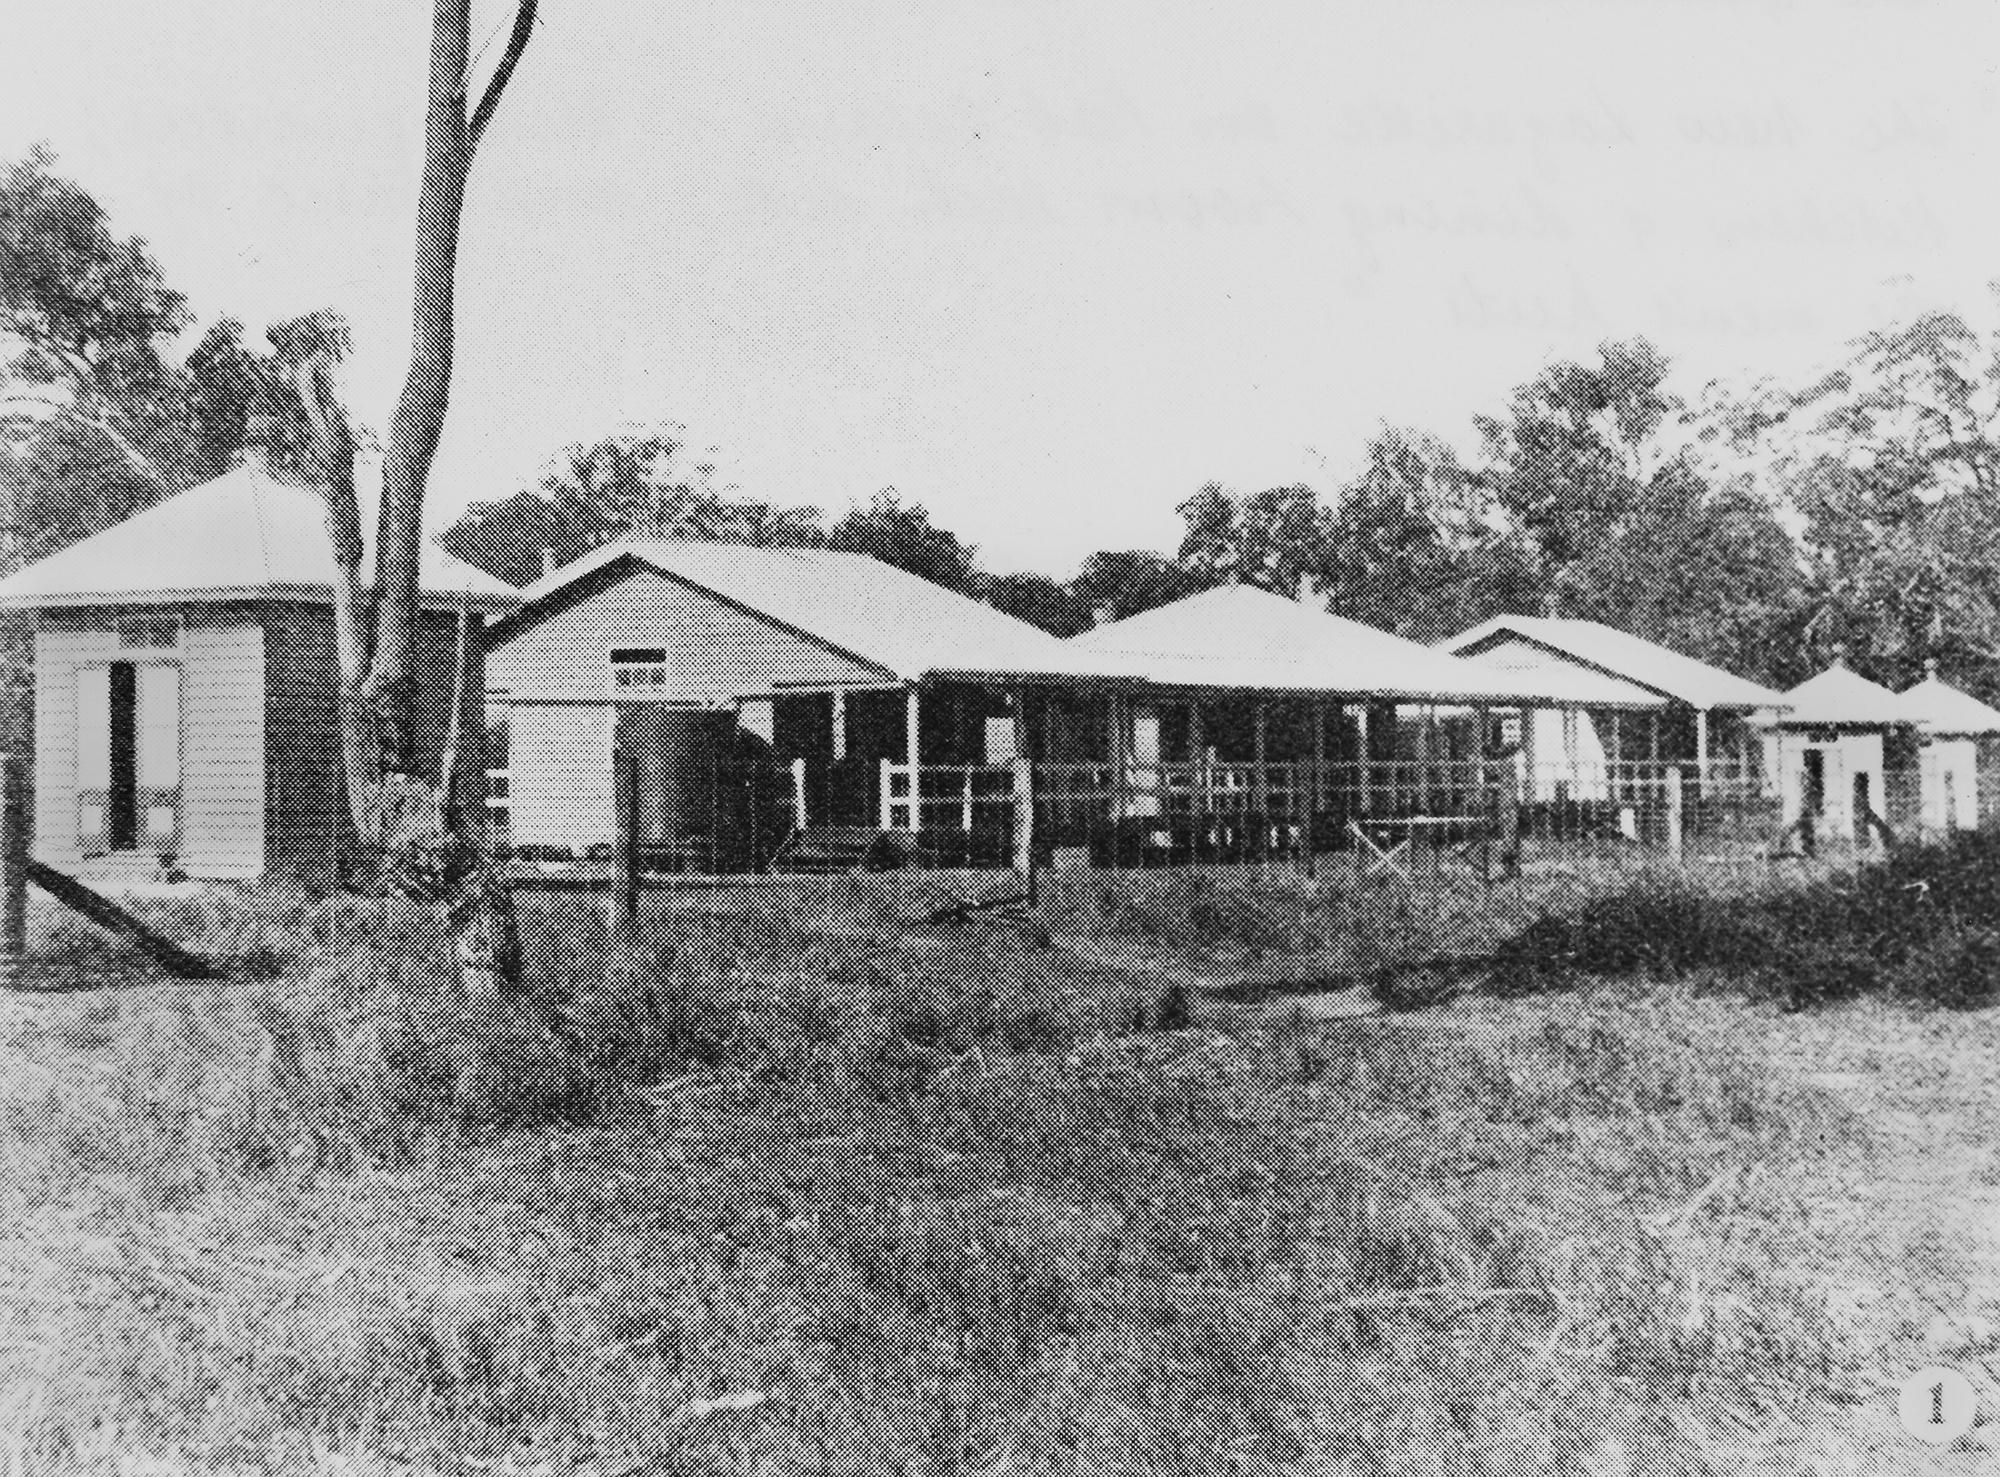 Peel Island lazarette huts and kitchen buildings, 1907